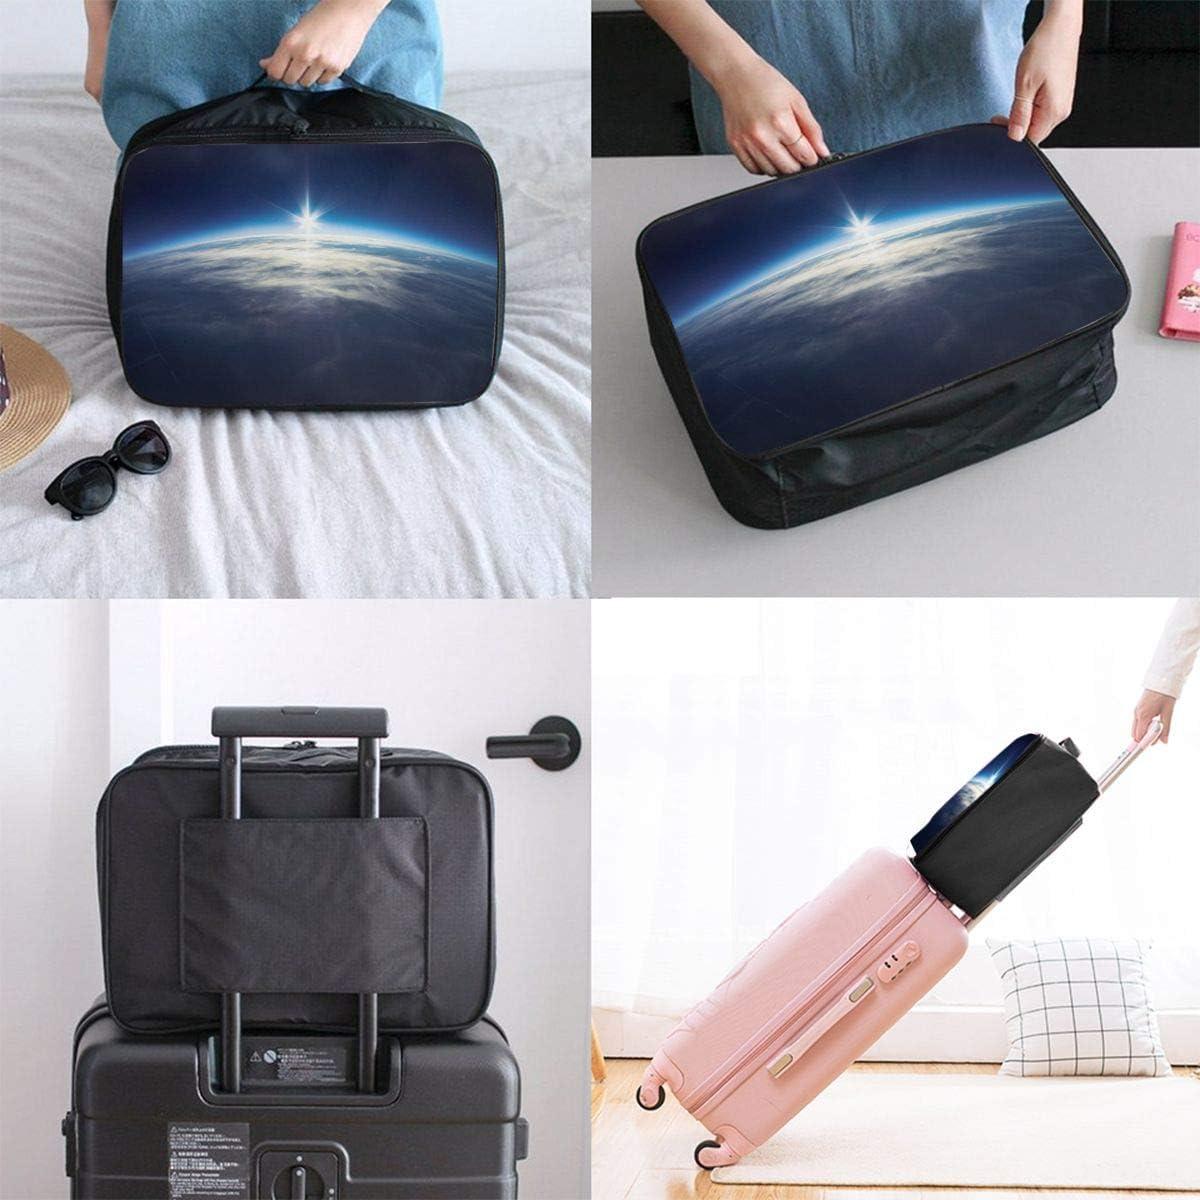 Seamless-lemon Travel Carry-on Luggage Weekender Bag Overnight Tote Flight Duffel In Trolley Handle